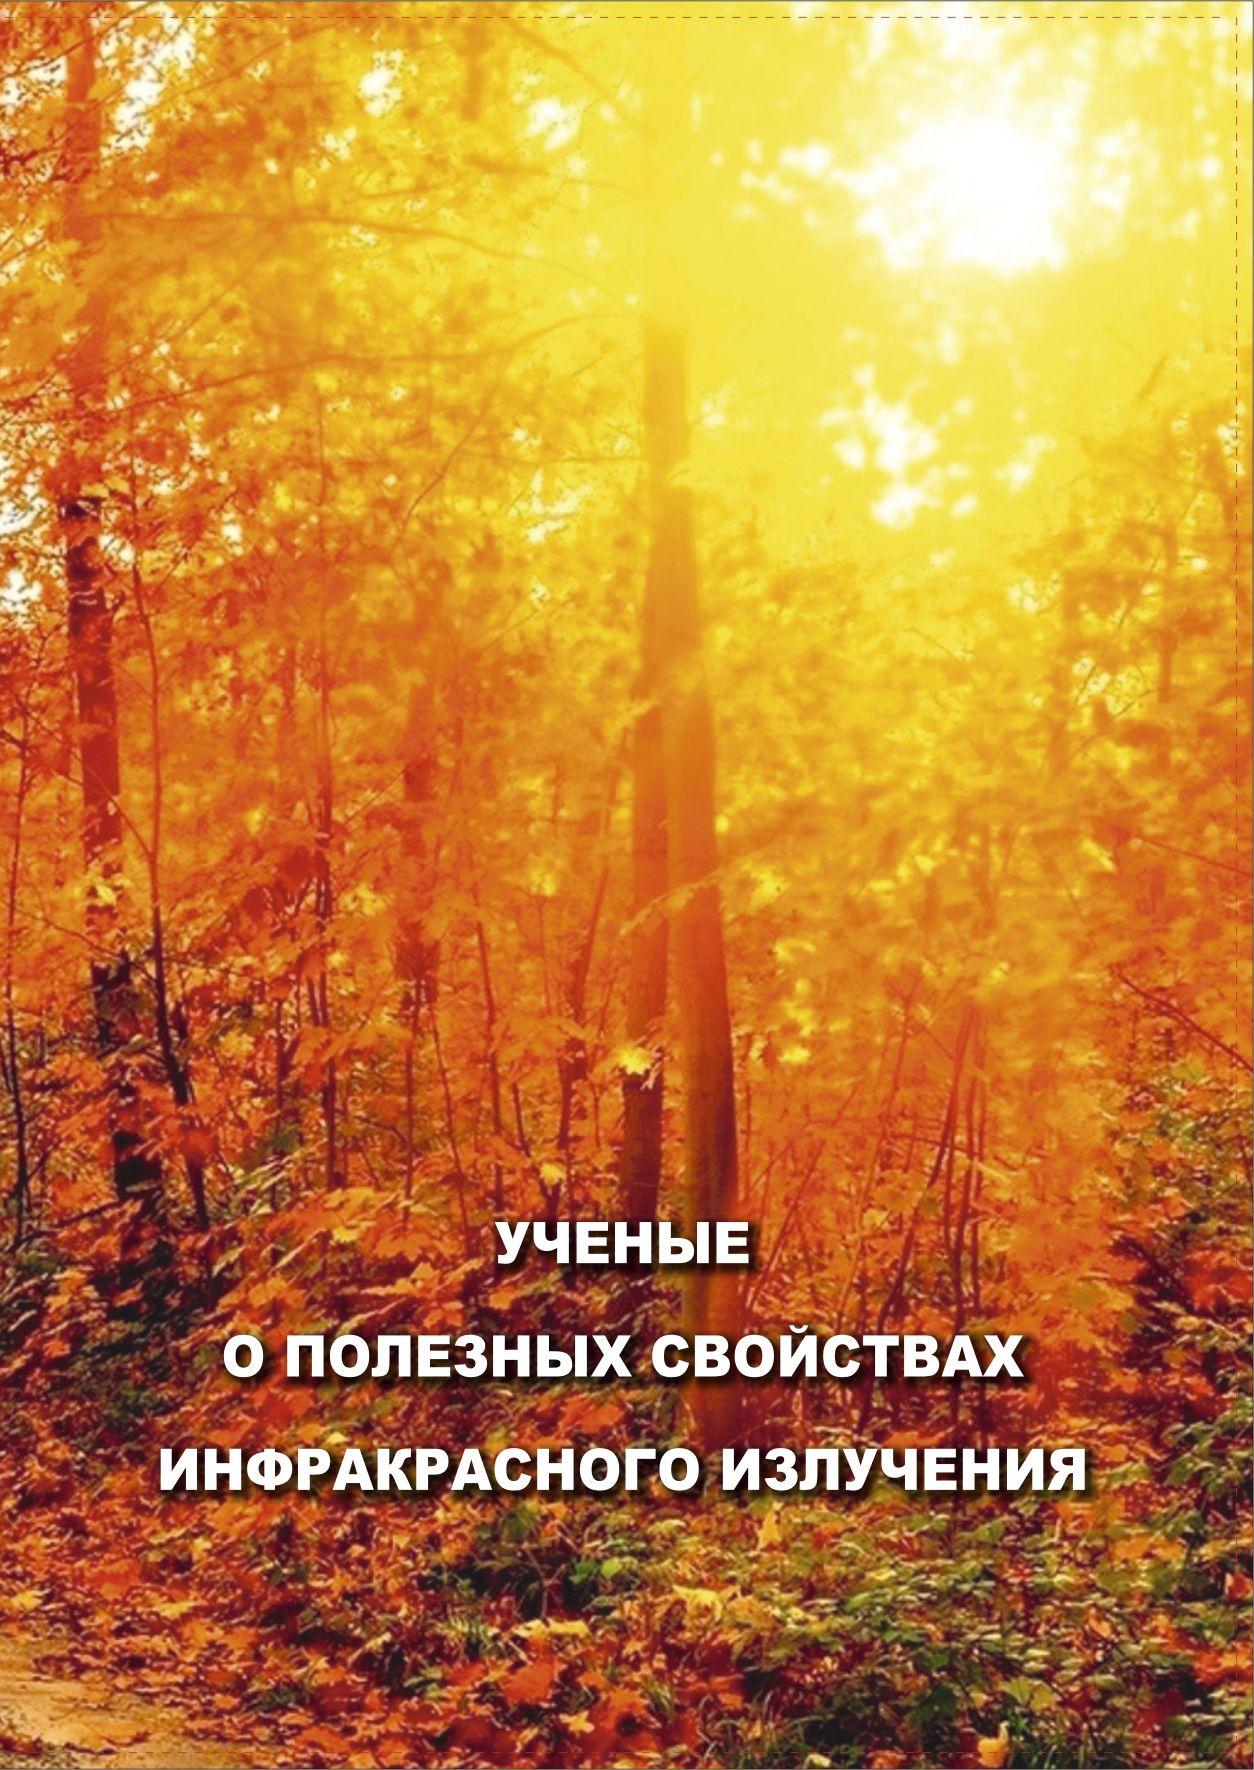 id_usloblzamena_a5__1